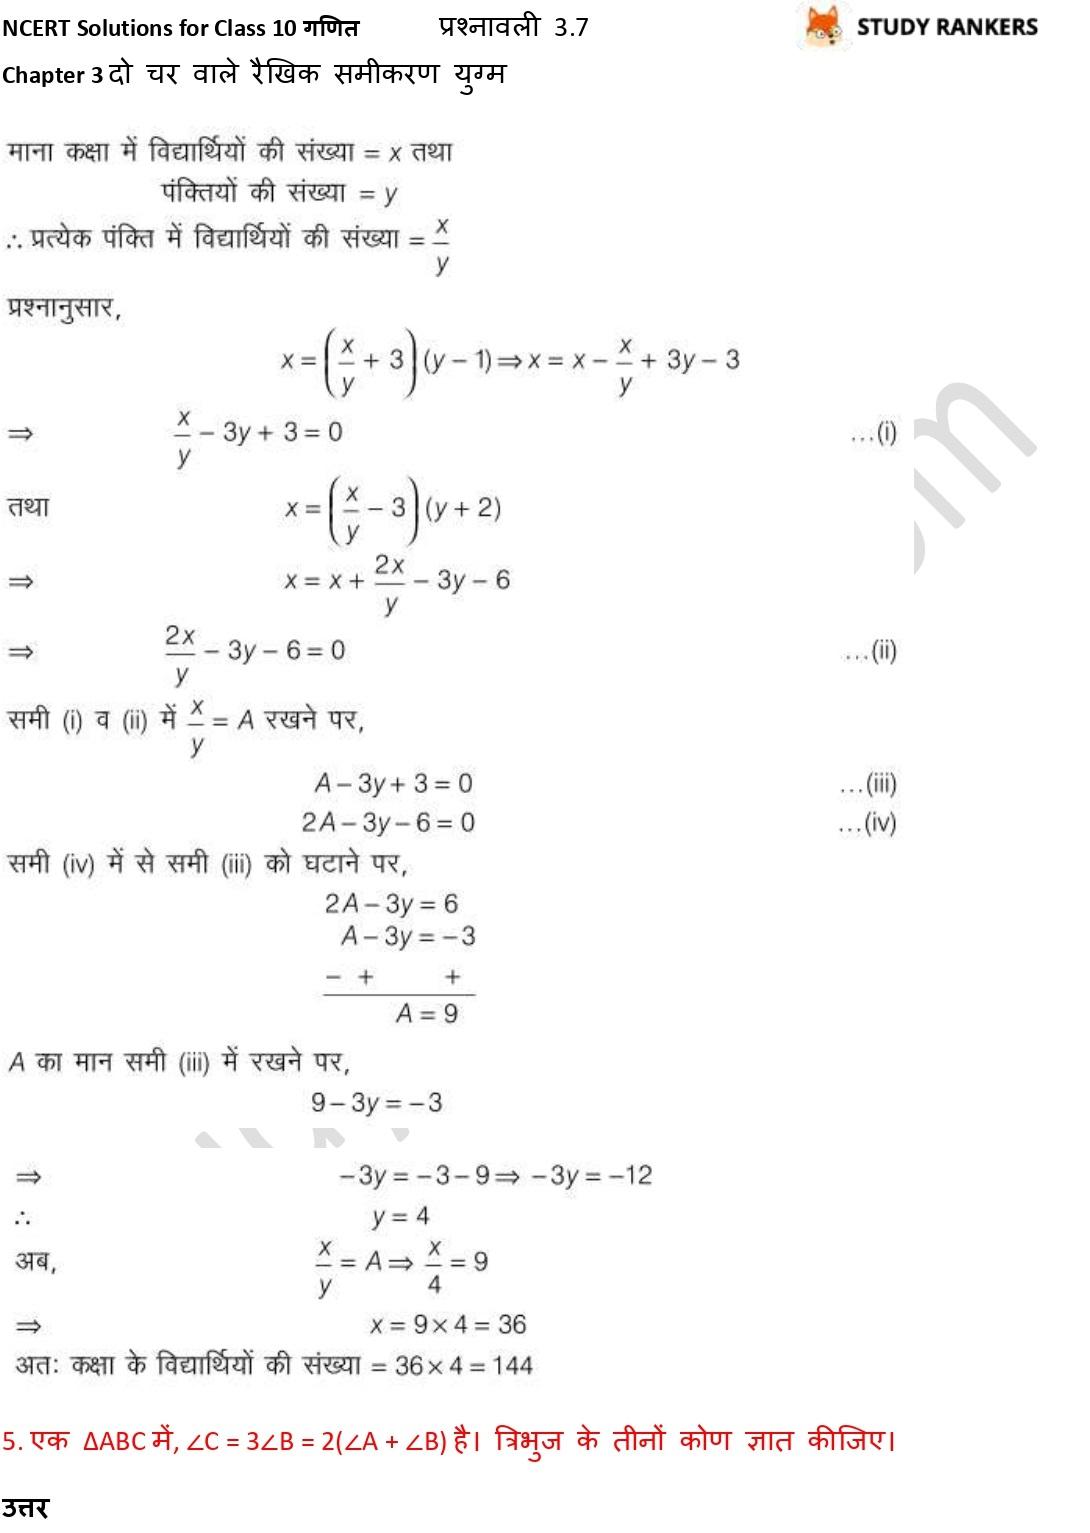 NCERT Solutions for Class 10 Maths Chapter 3 दो चर वाले रैखिक समीकरण युग्म प्रश्नावली 3.7 Part 4